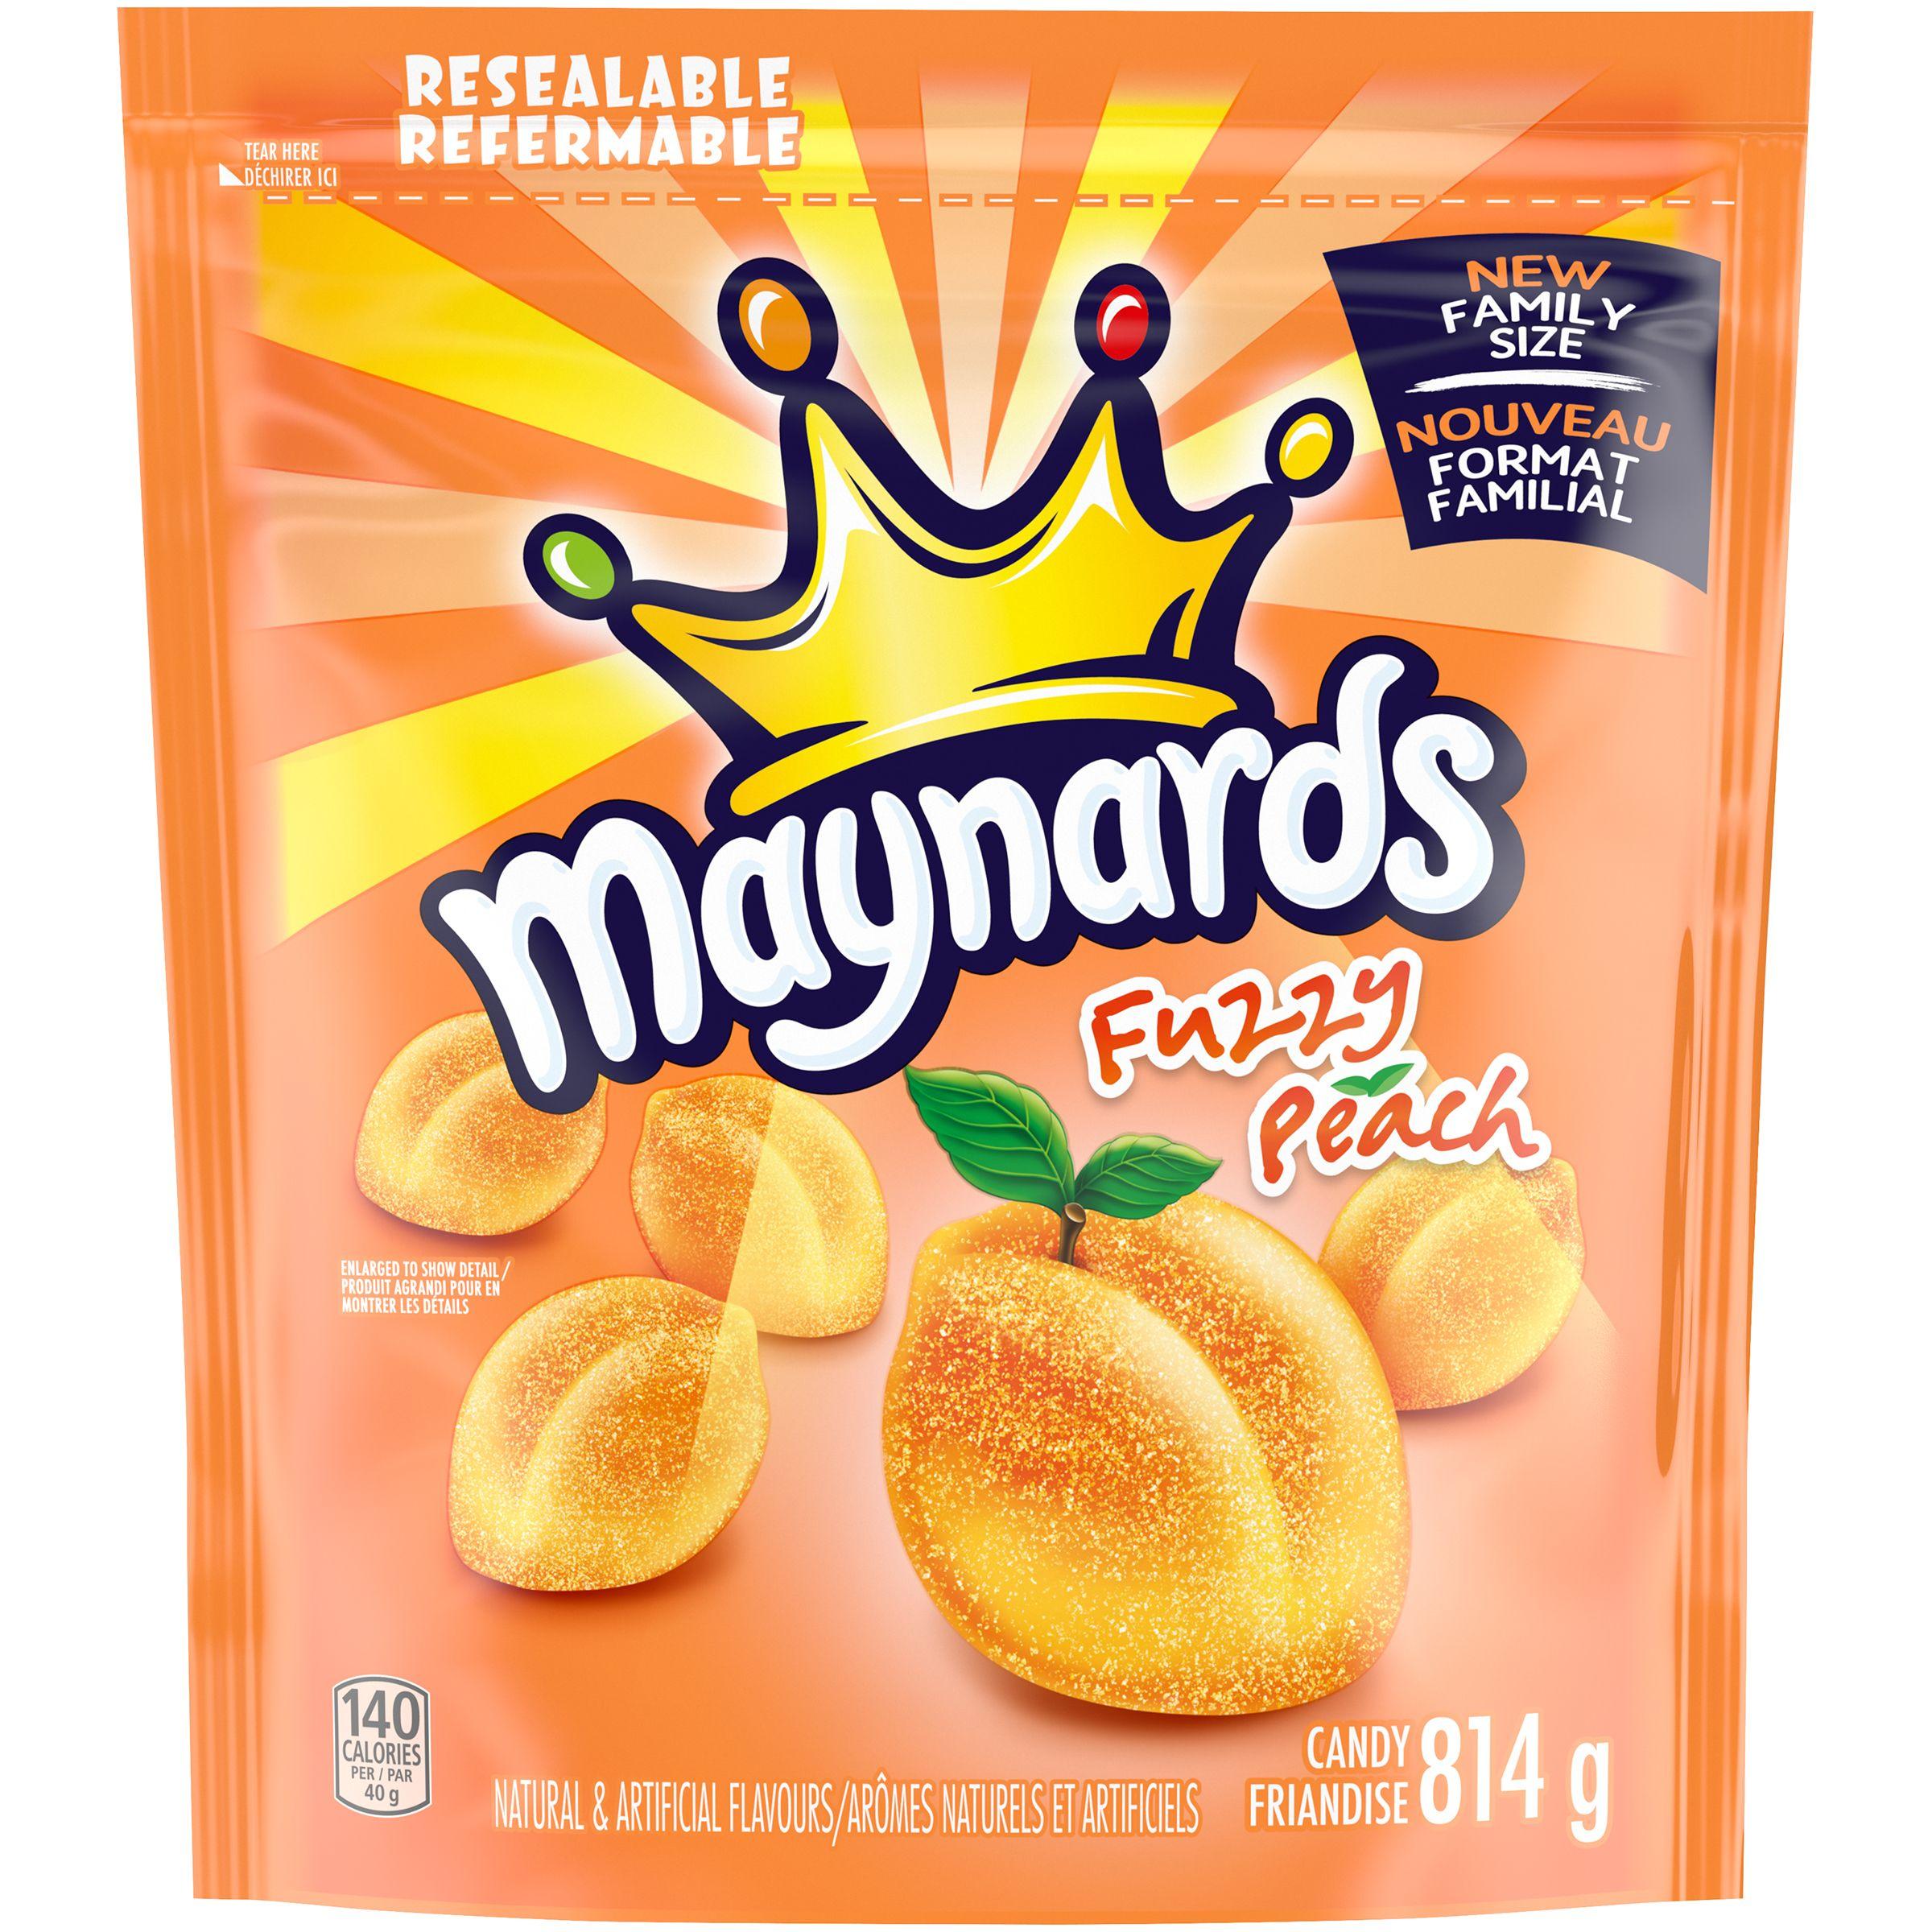 Maynards Fuzzy Peach Soft Candy 814 G